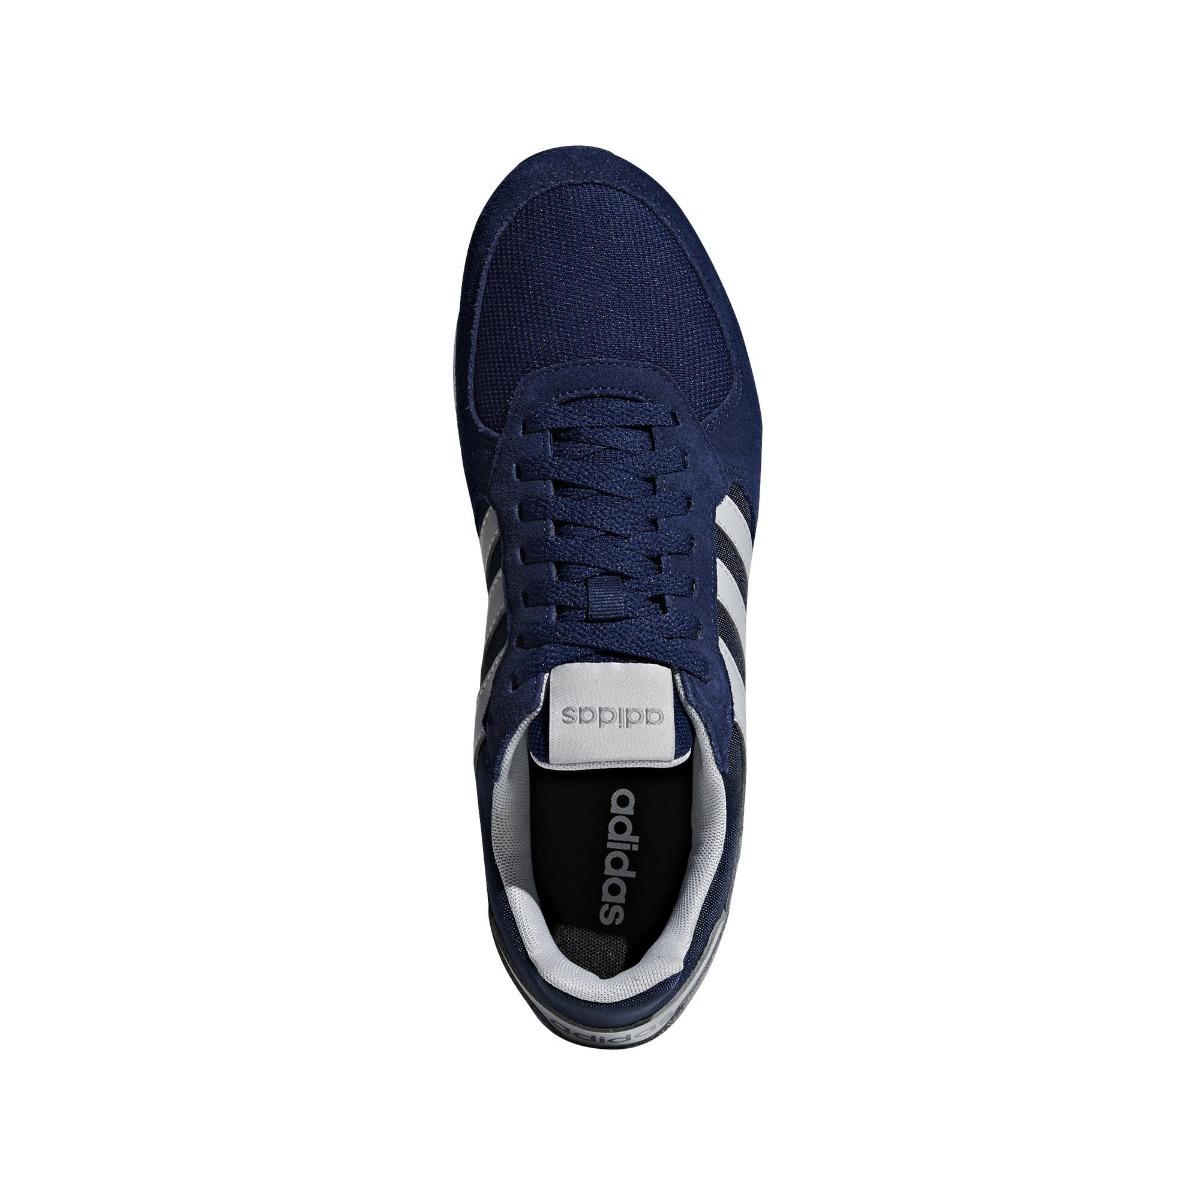 best loved 32f3b b01db Cargando zoom... zapatillas lifestyle adidas 8k bl hombre on sports